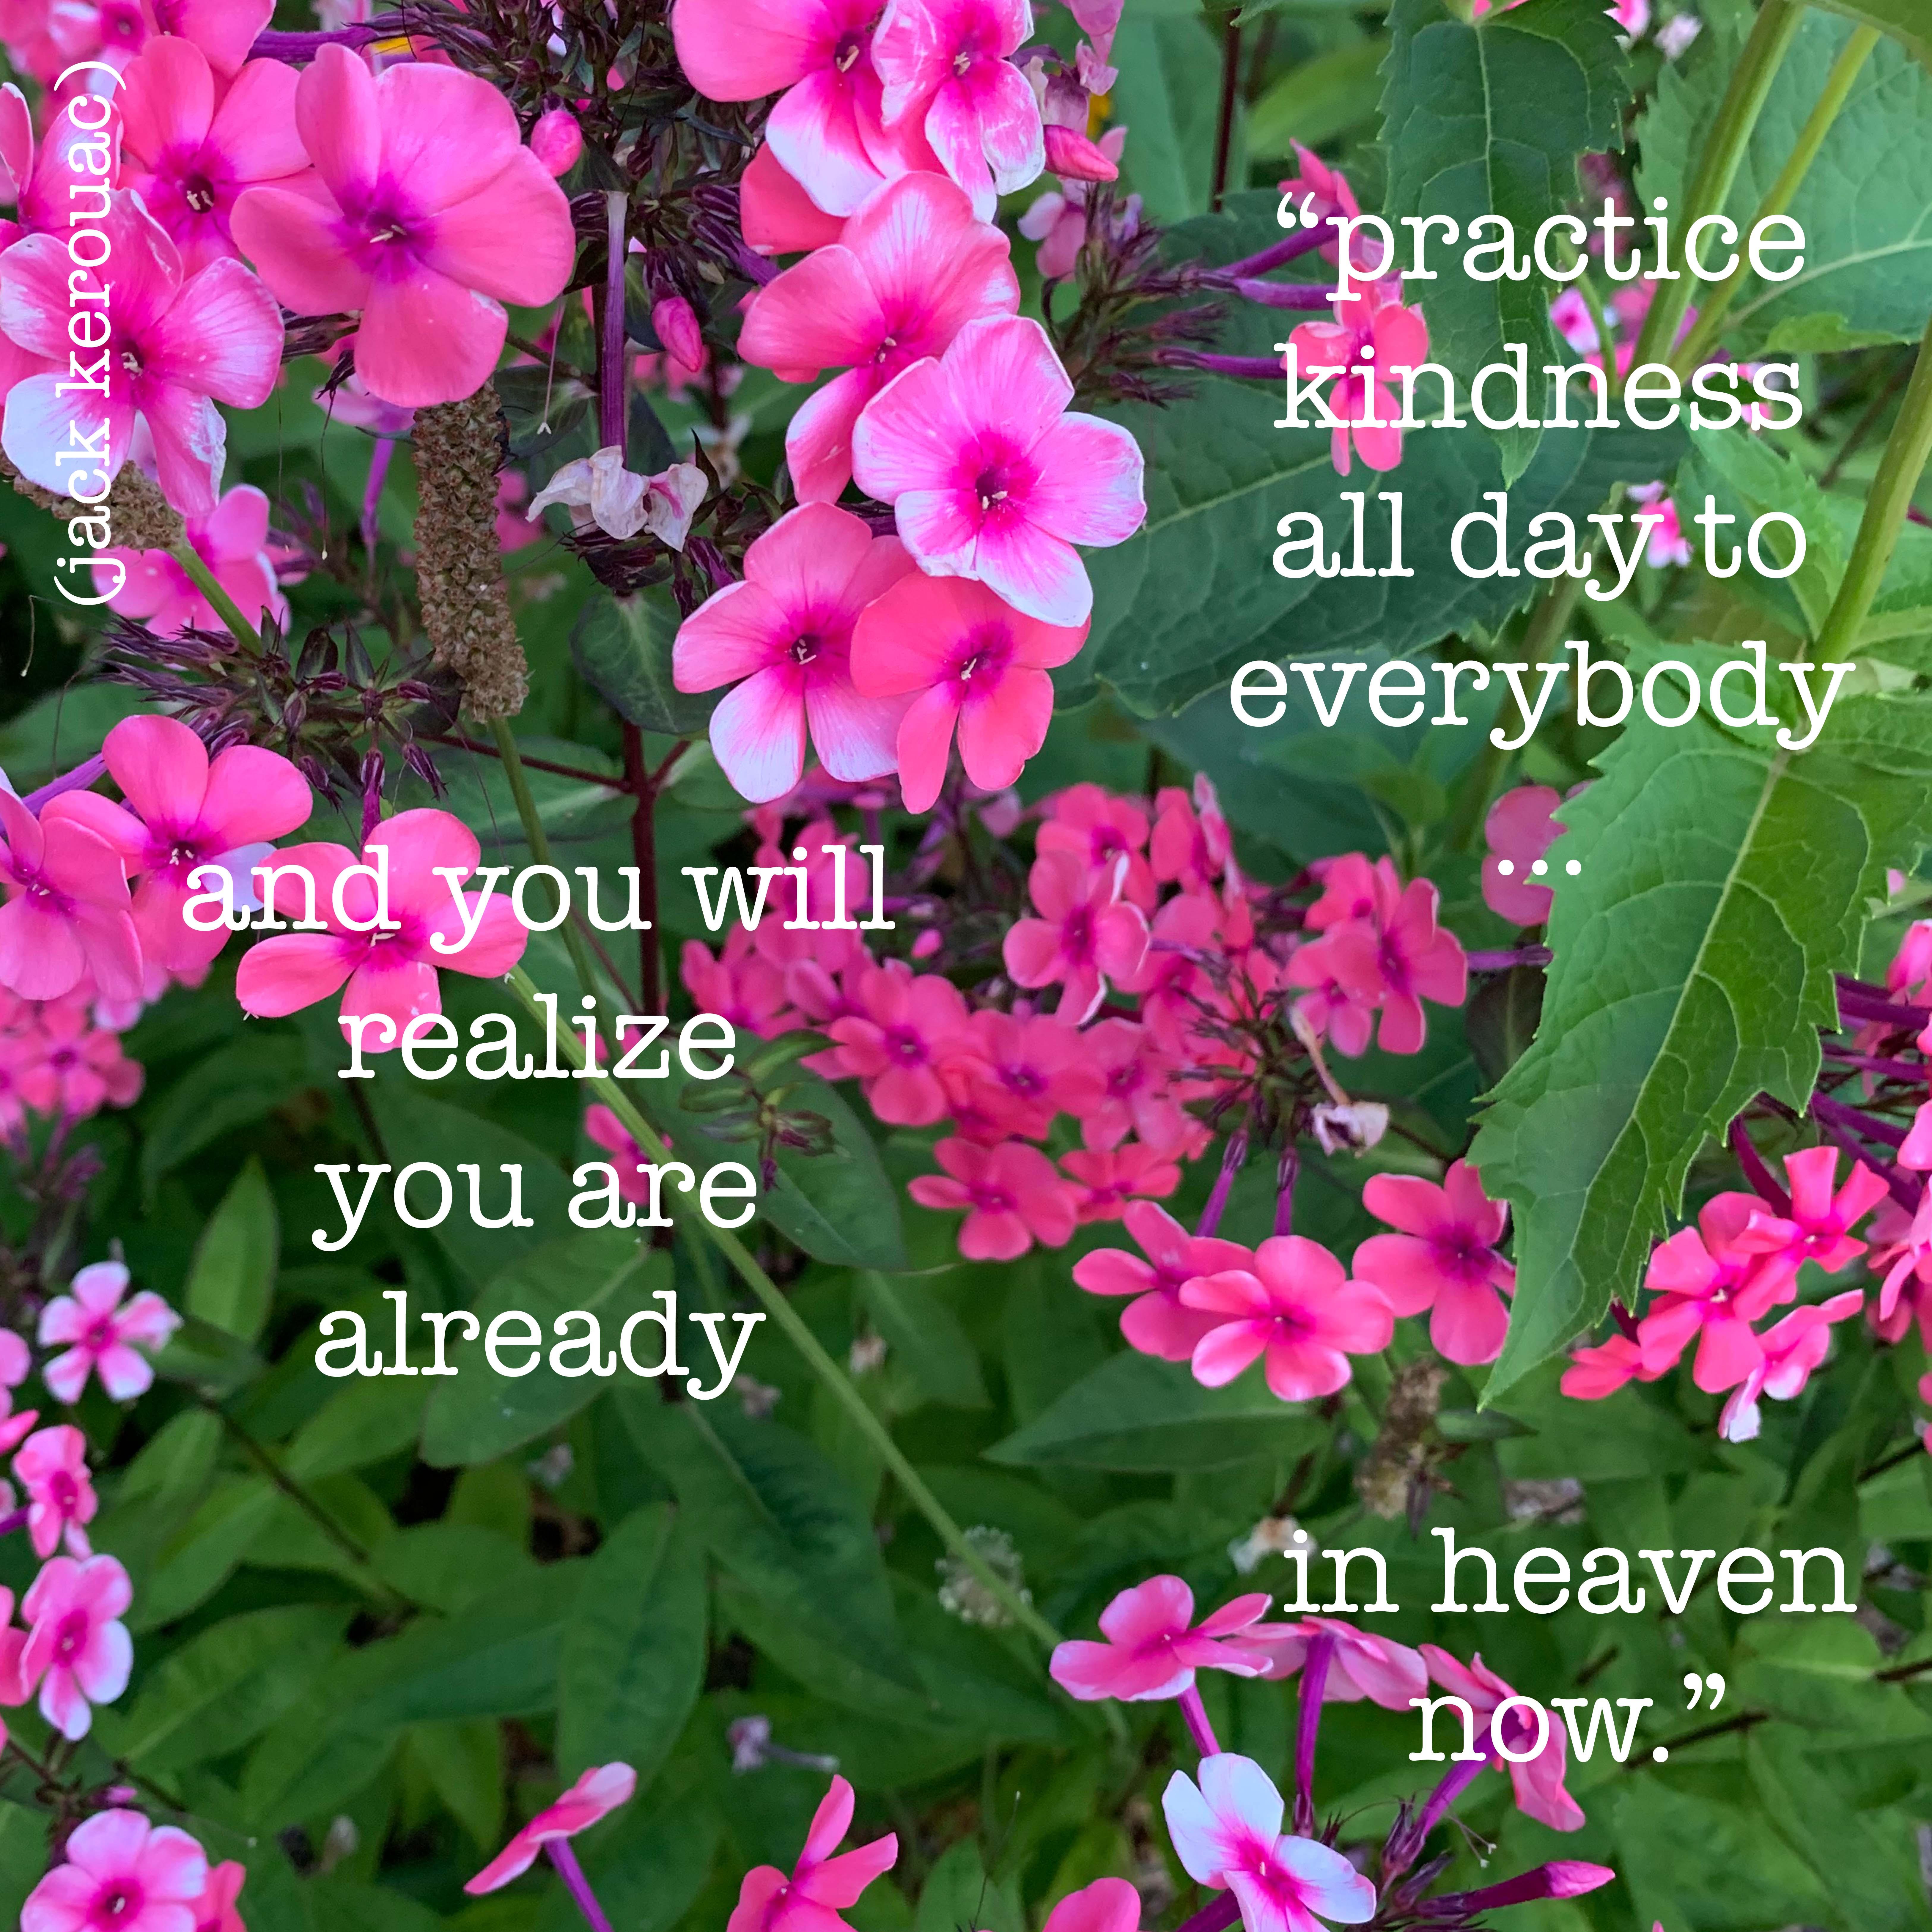 kindness kerouac